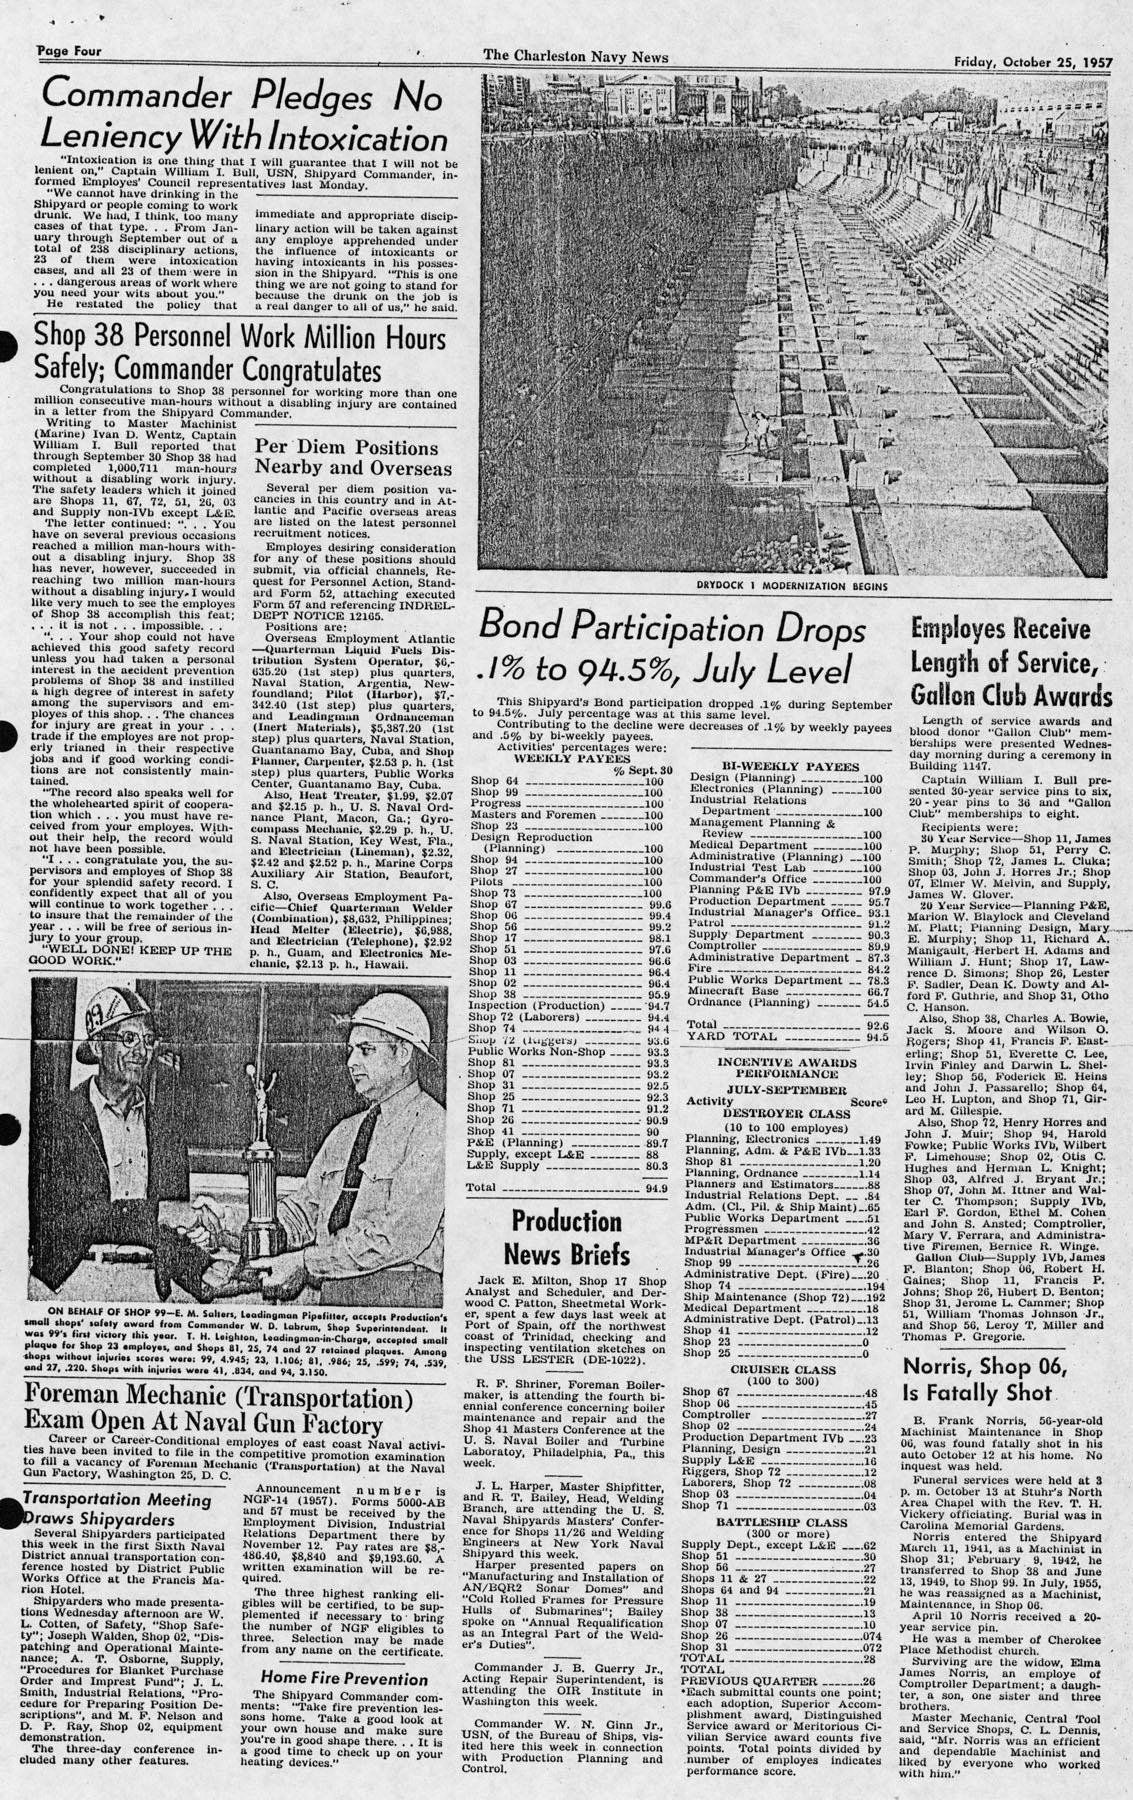 The Charleston Navy News, Volume 16, Edition 7, page iv